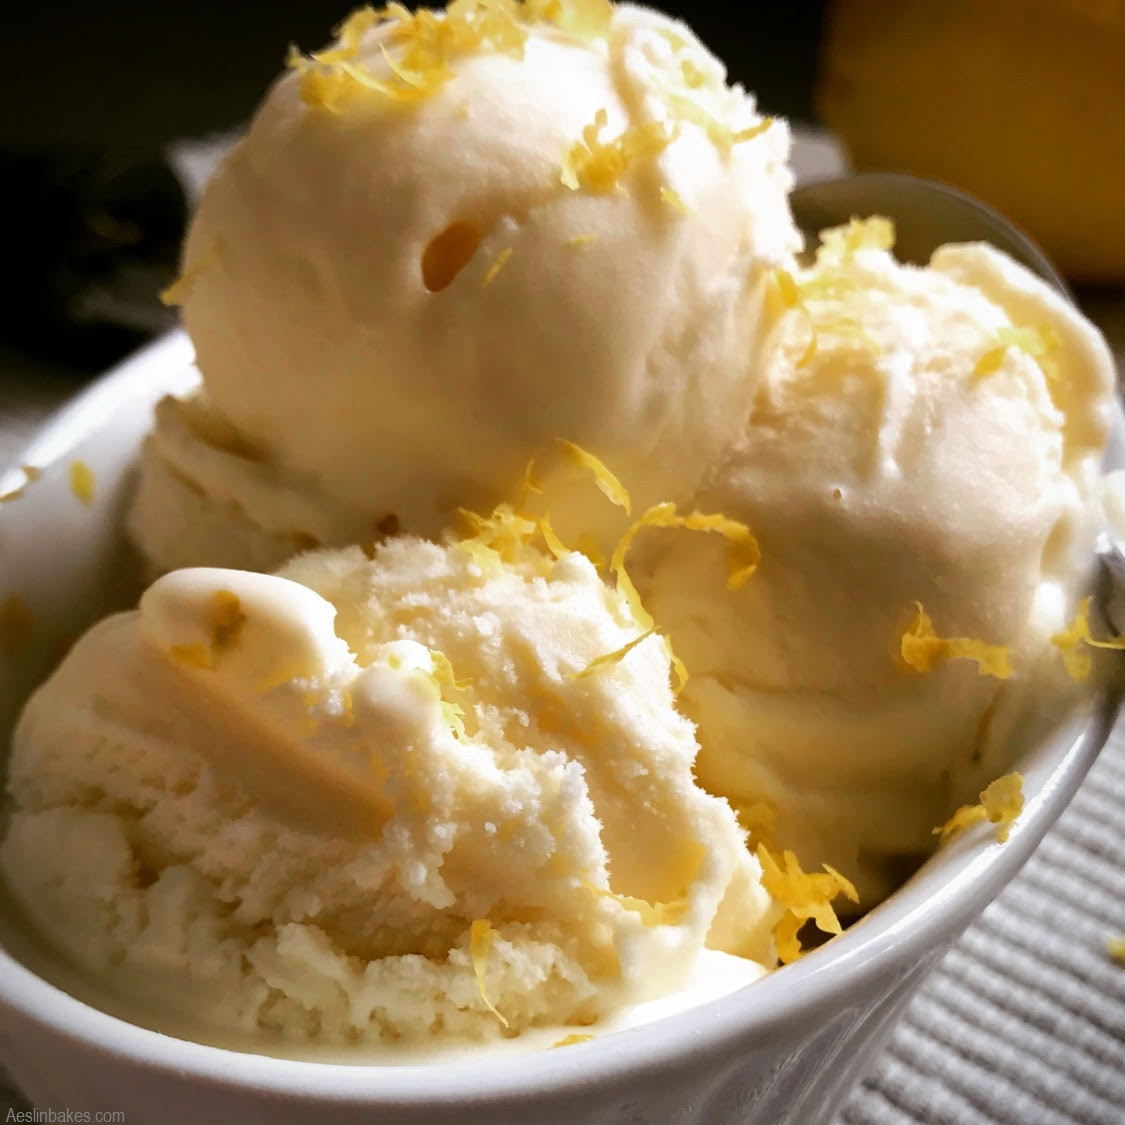 bowl of lemon ice cream